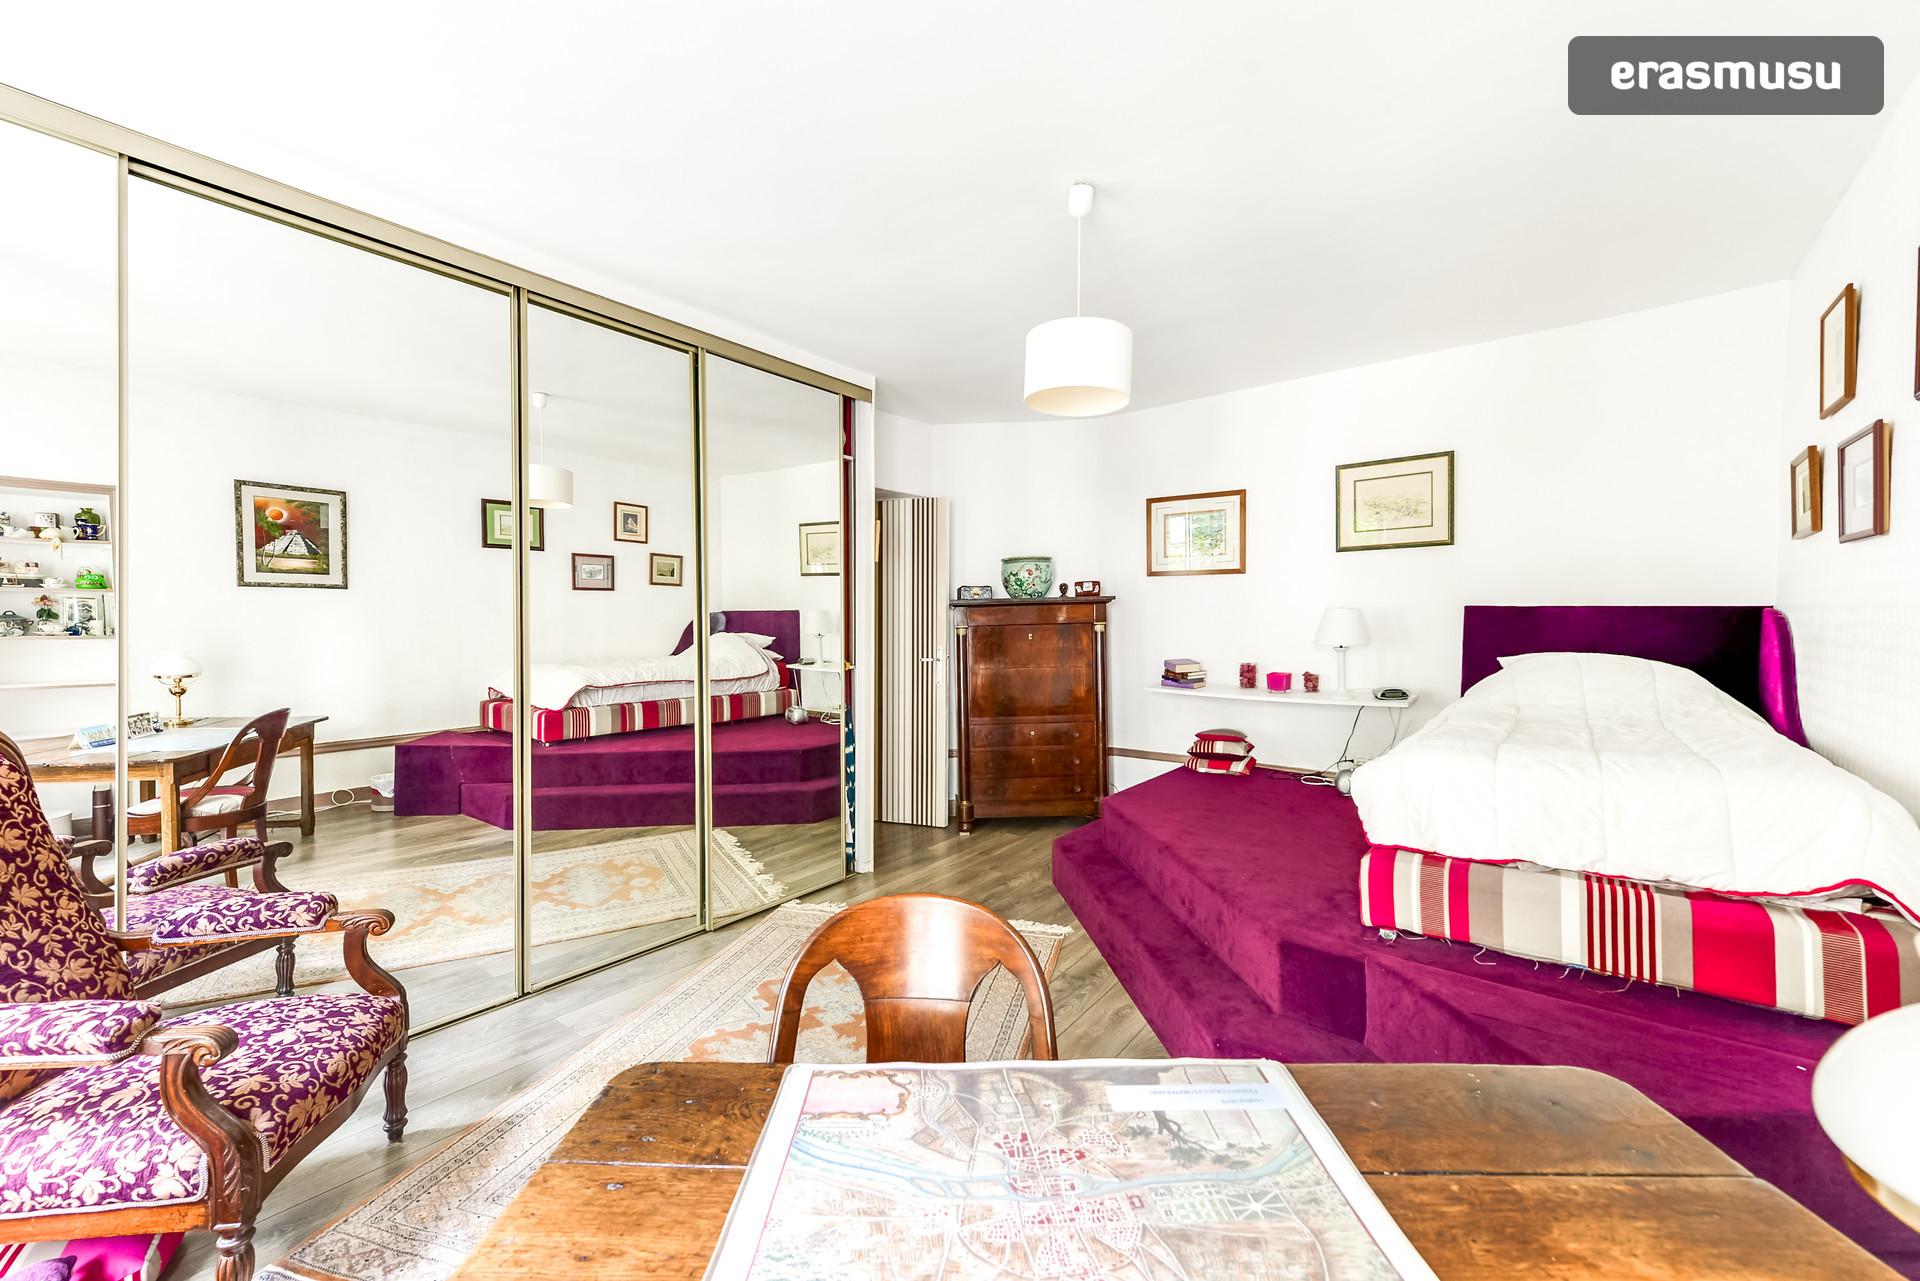 chambre individuelle avec salle de bain priv e et toilette priv es single room with private. Black Bedroom Furniture Sets. Home Design Ideas